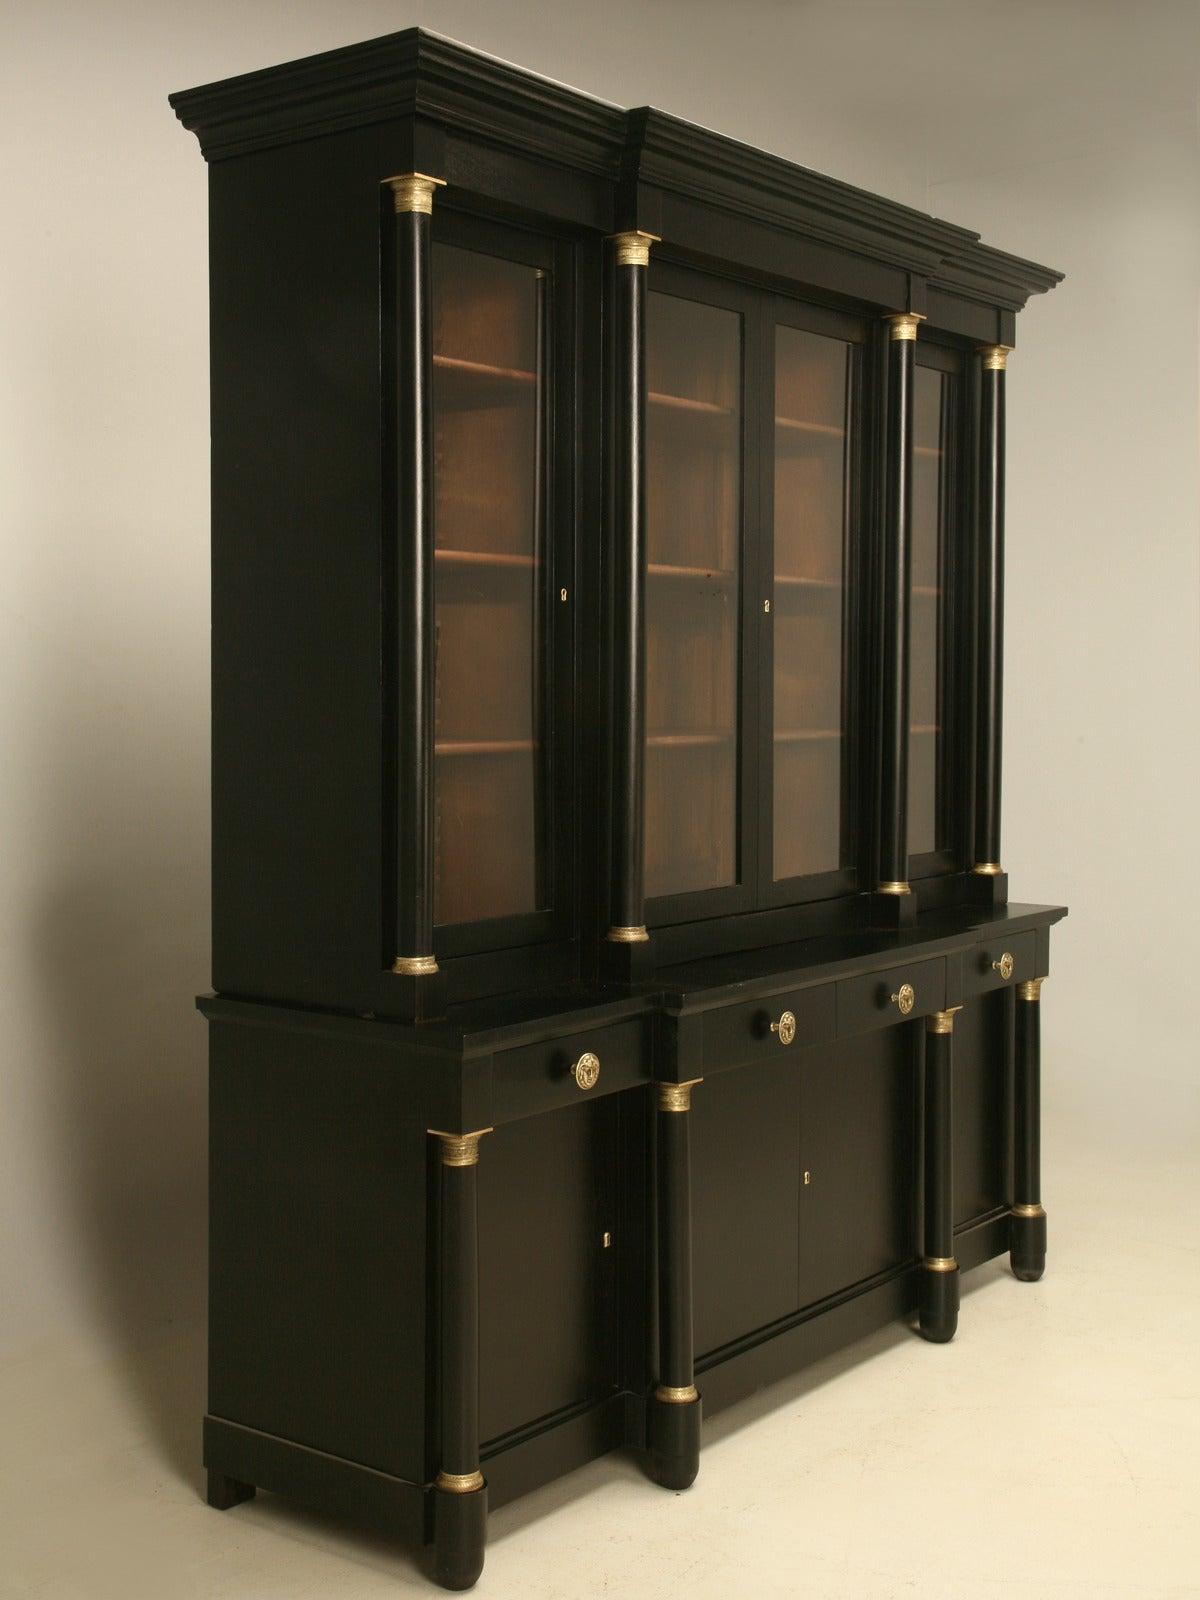 French Empire Style Bookcase With An Ebonized Magohany